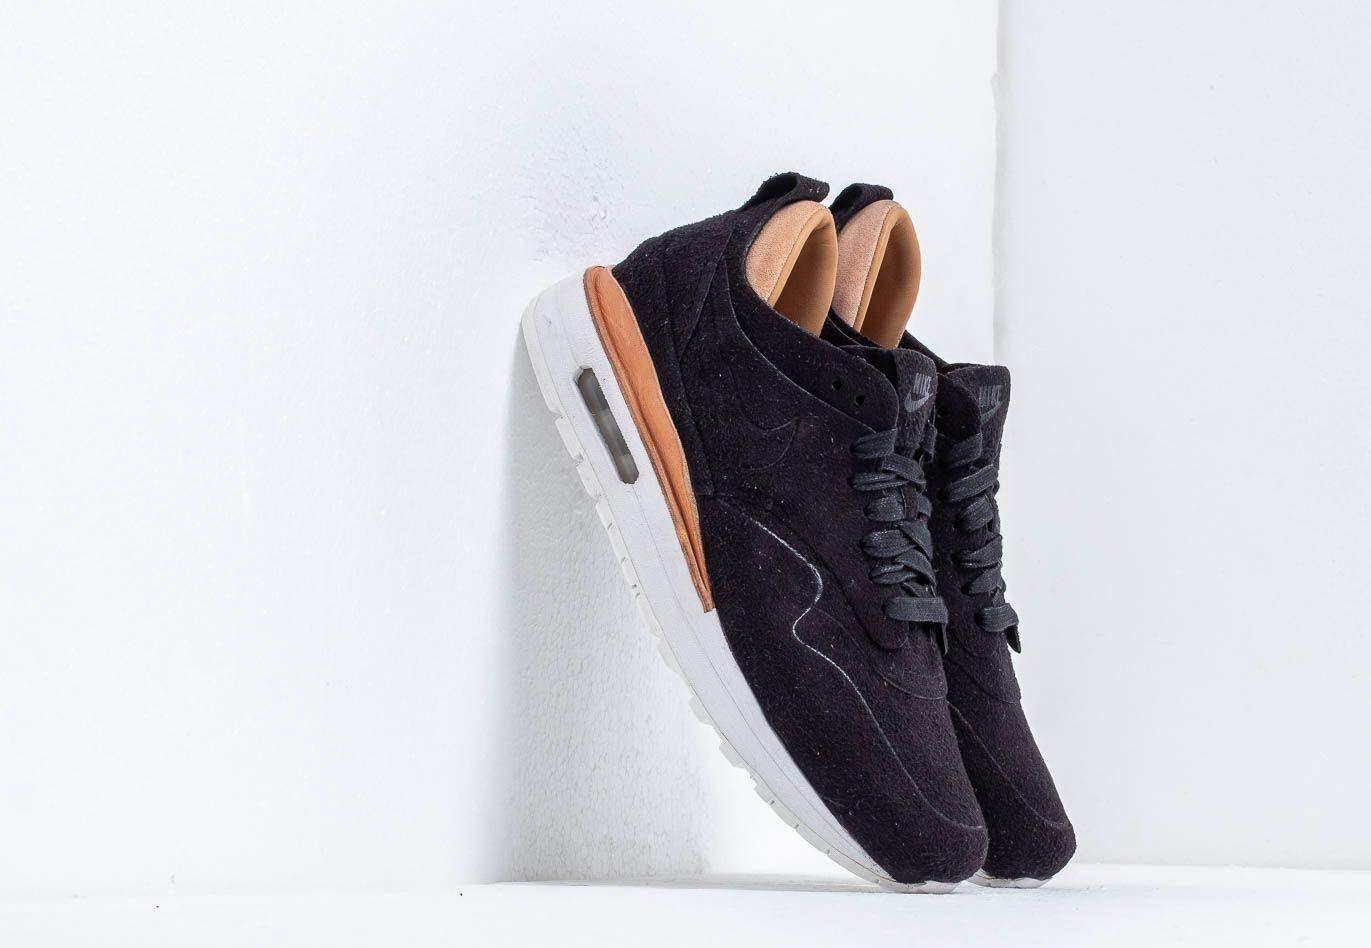 Nike Wmns Air Max 1 Royal Black/ Black